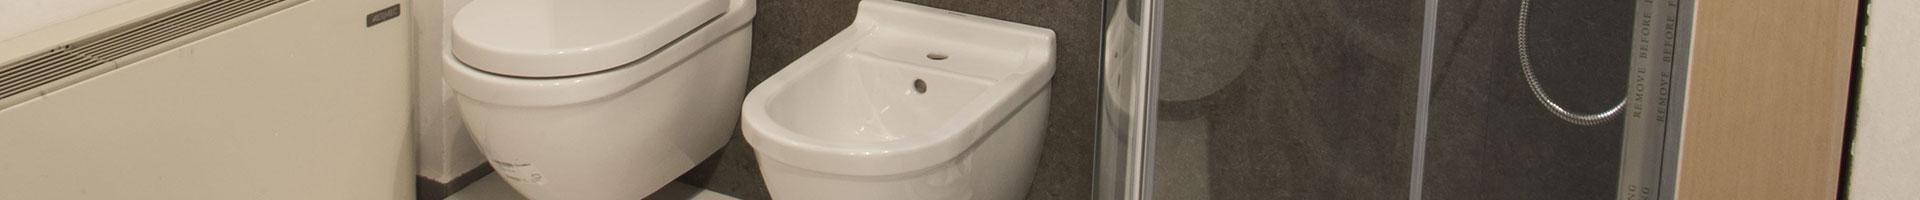 rivestimenti in ceramica per bagno